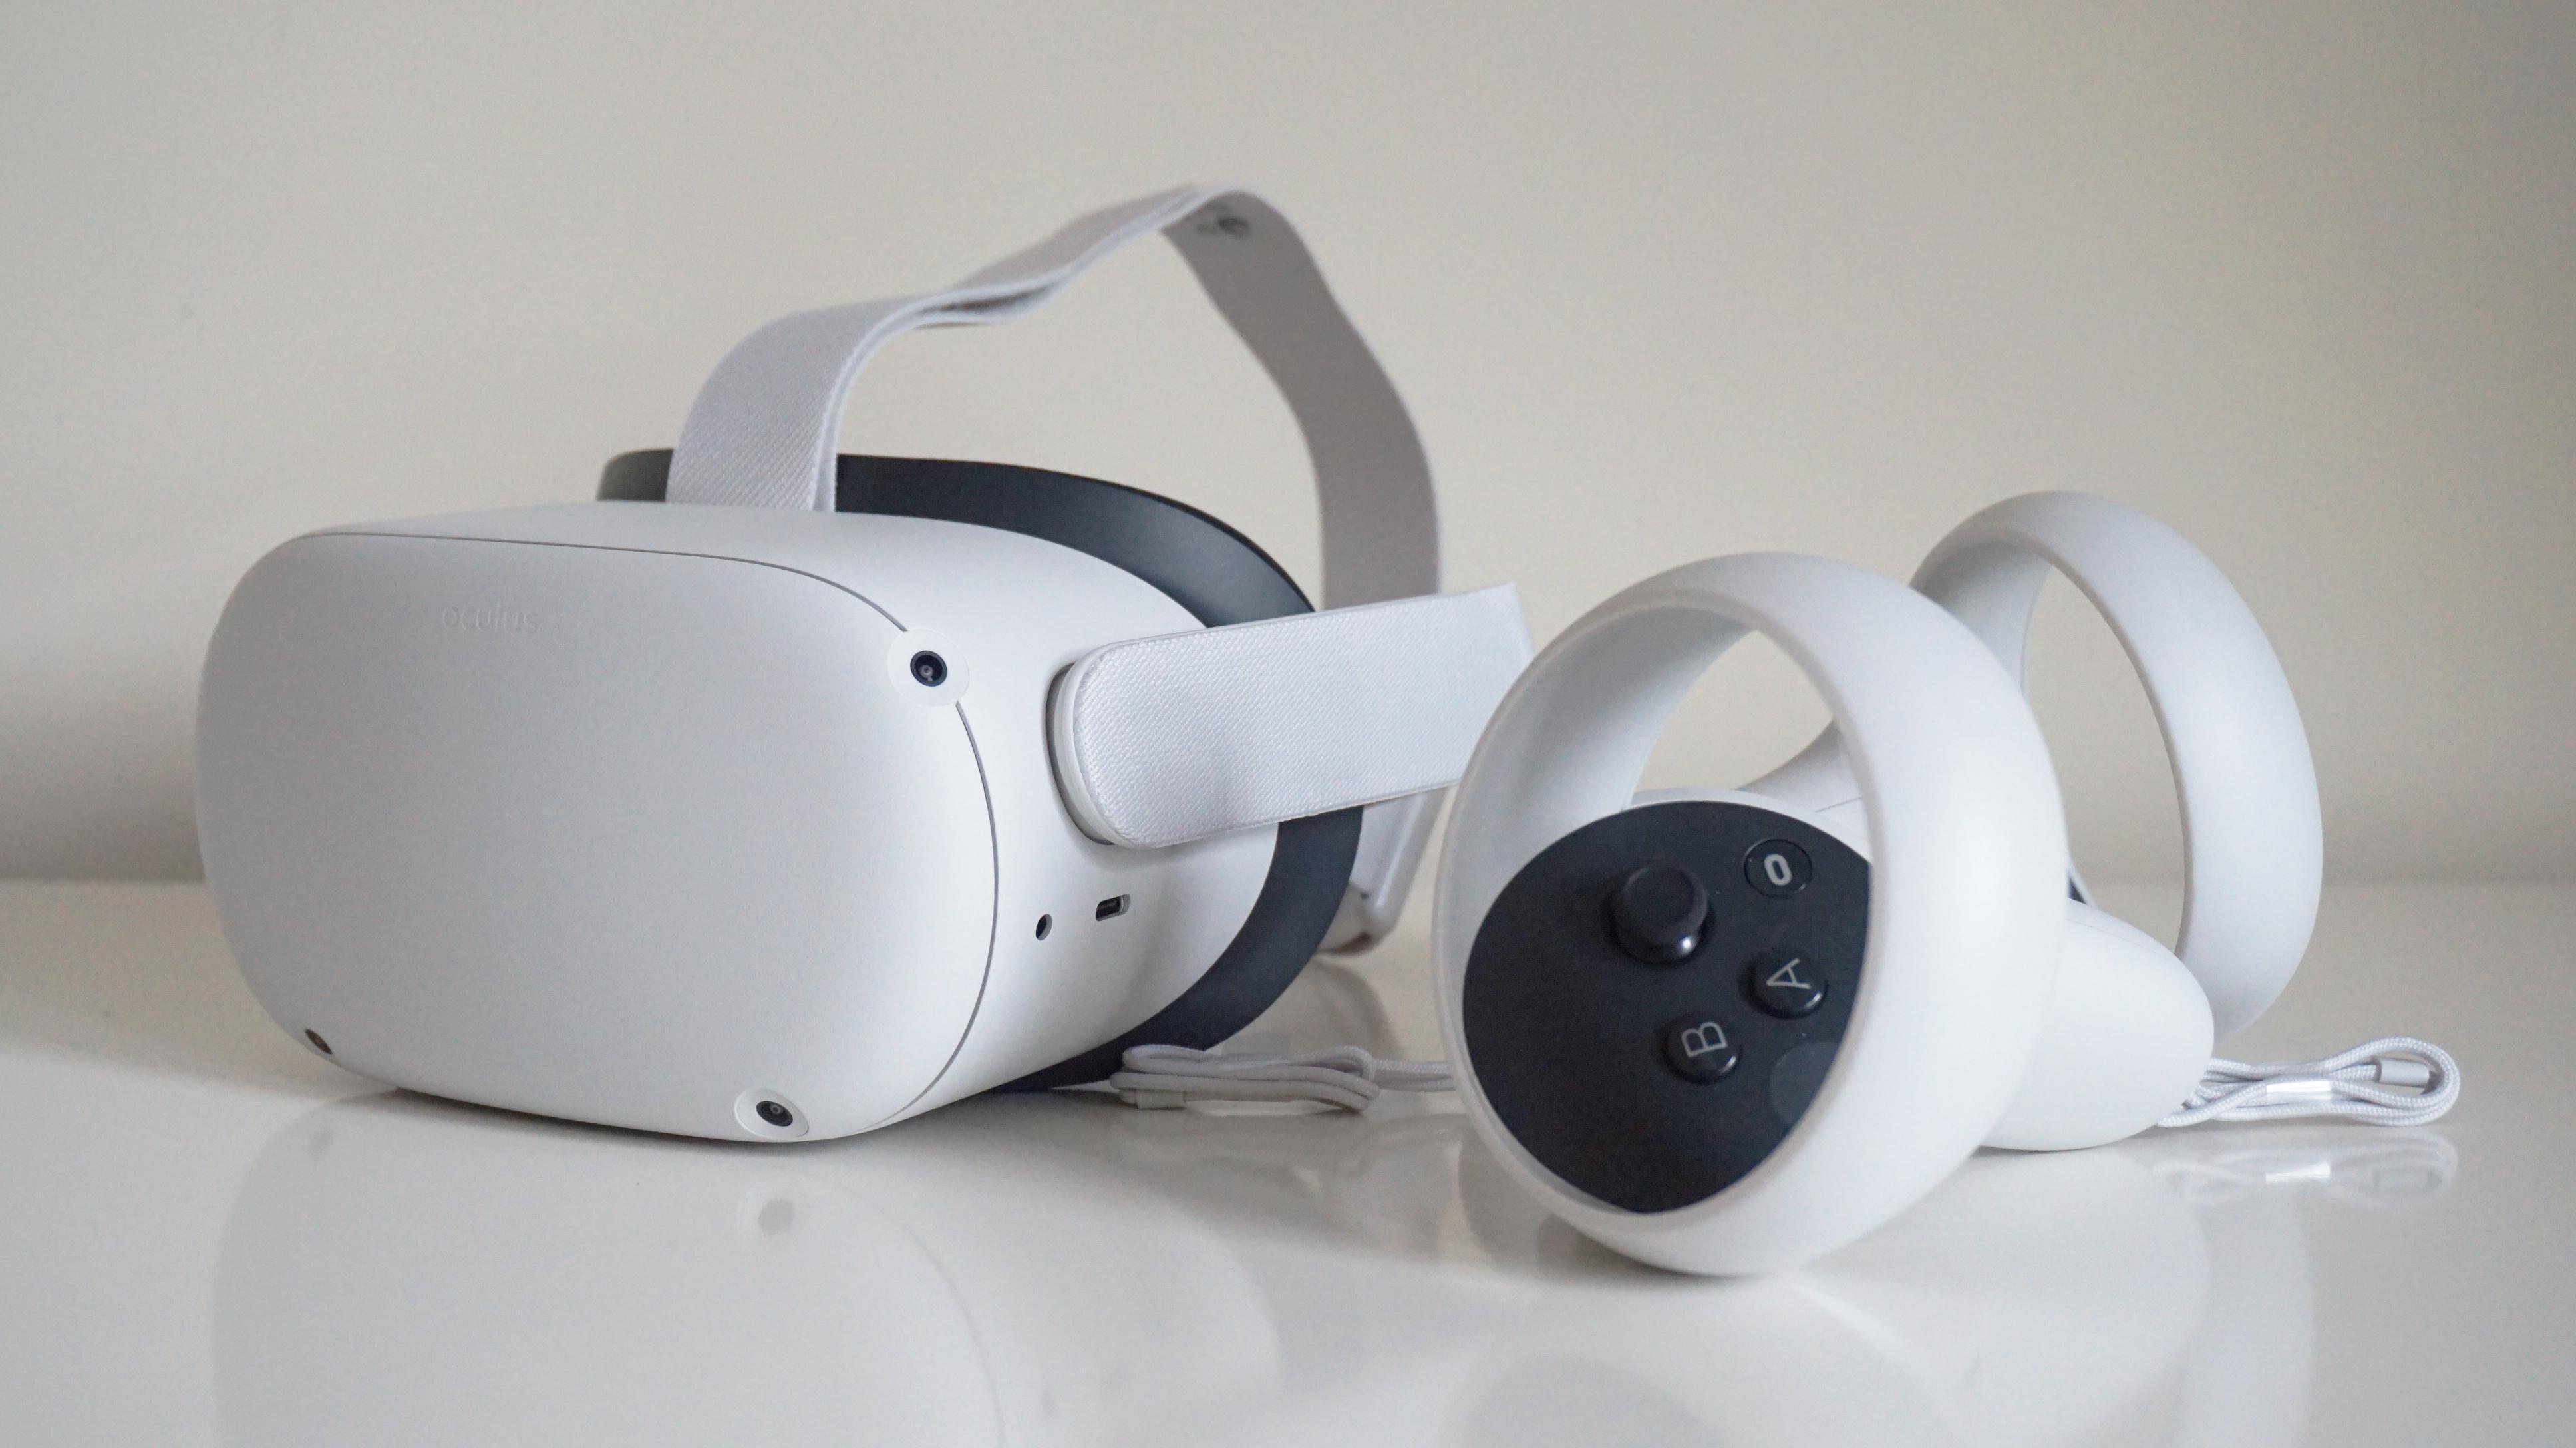 Oculus Quest 2 review: a worthy successor to the Rift S | Rock Paper Shotgun